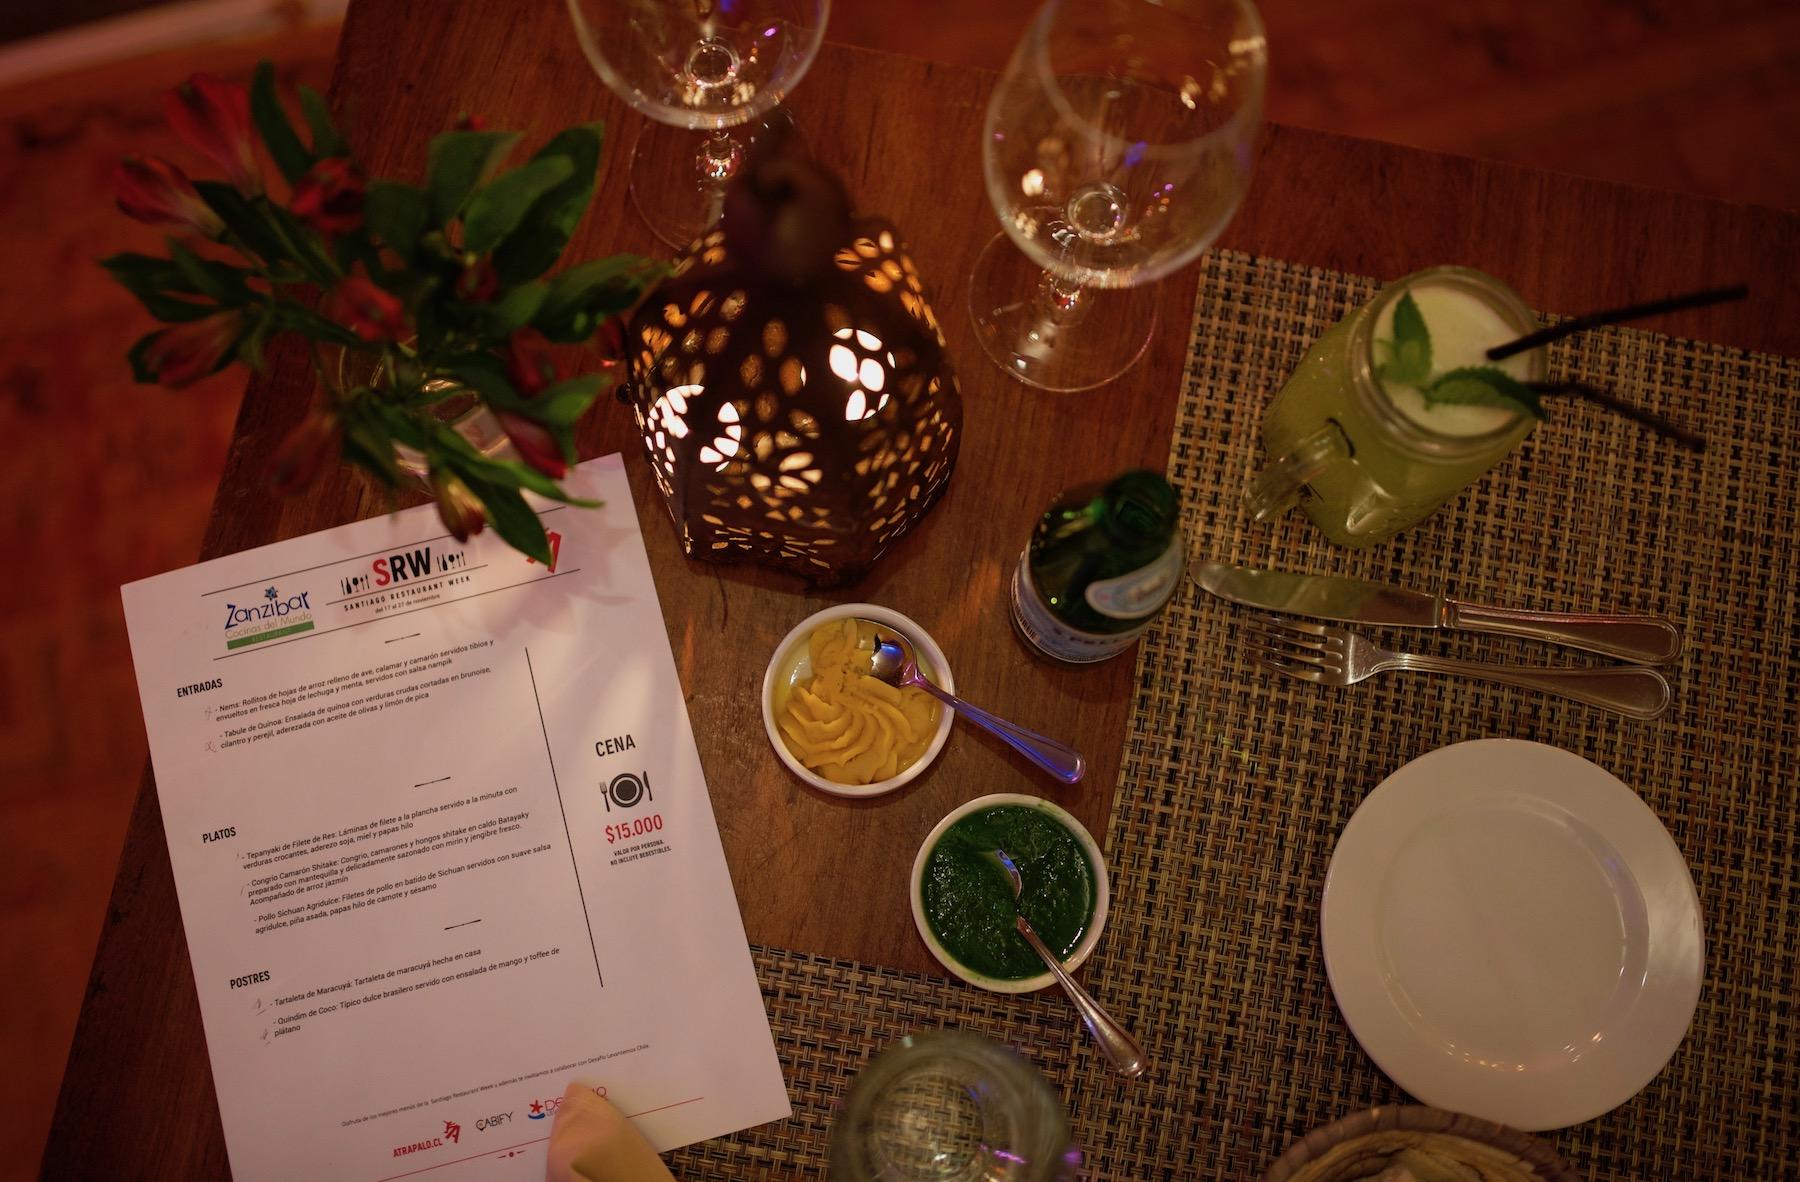 jantar-restaurante-zanzibar-santiago-chile-3